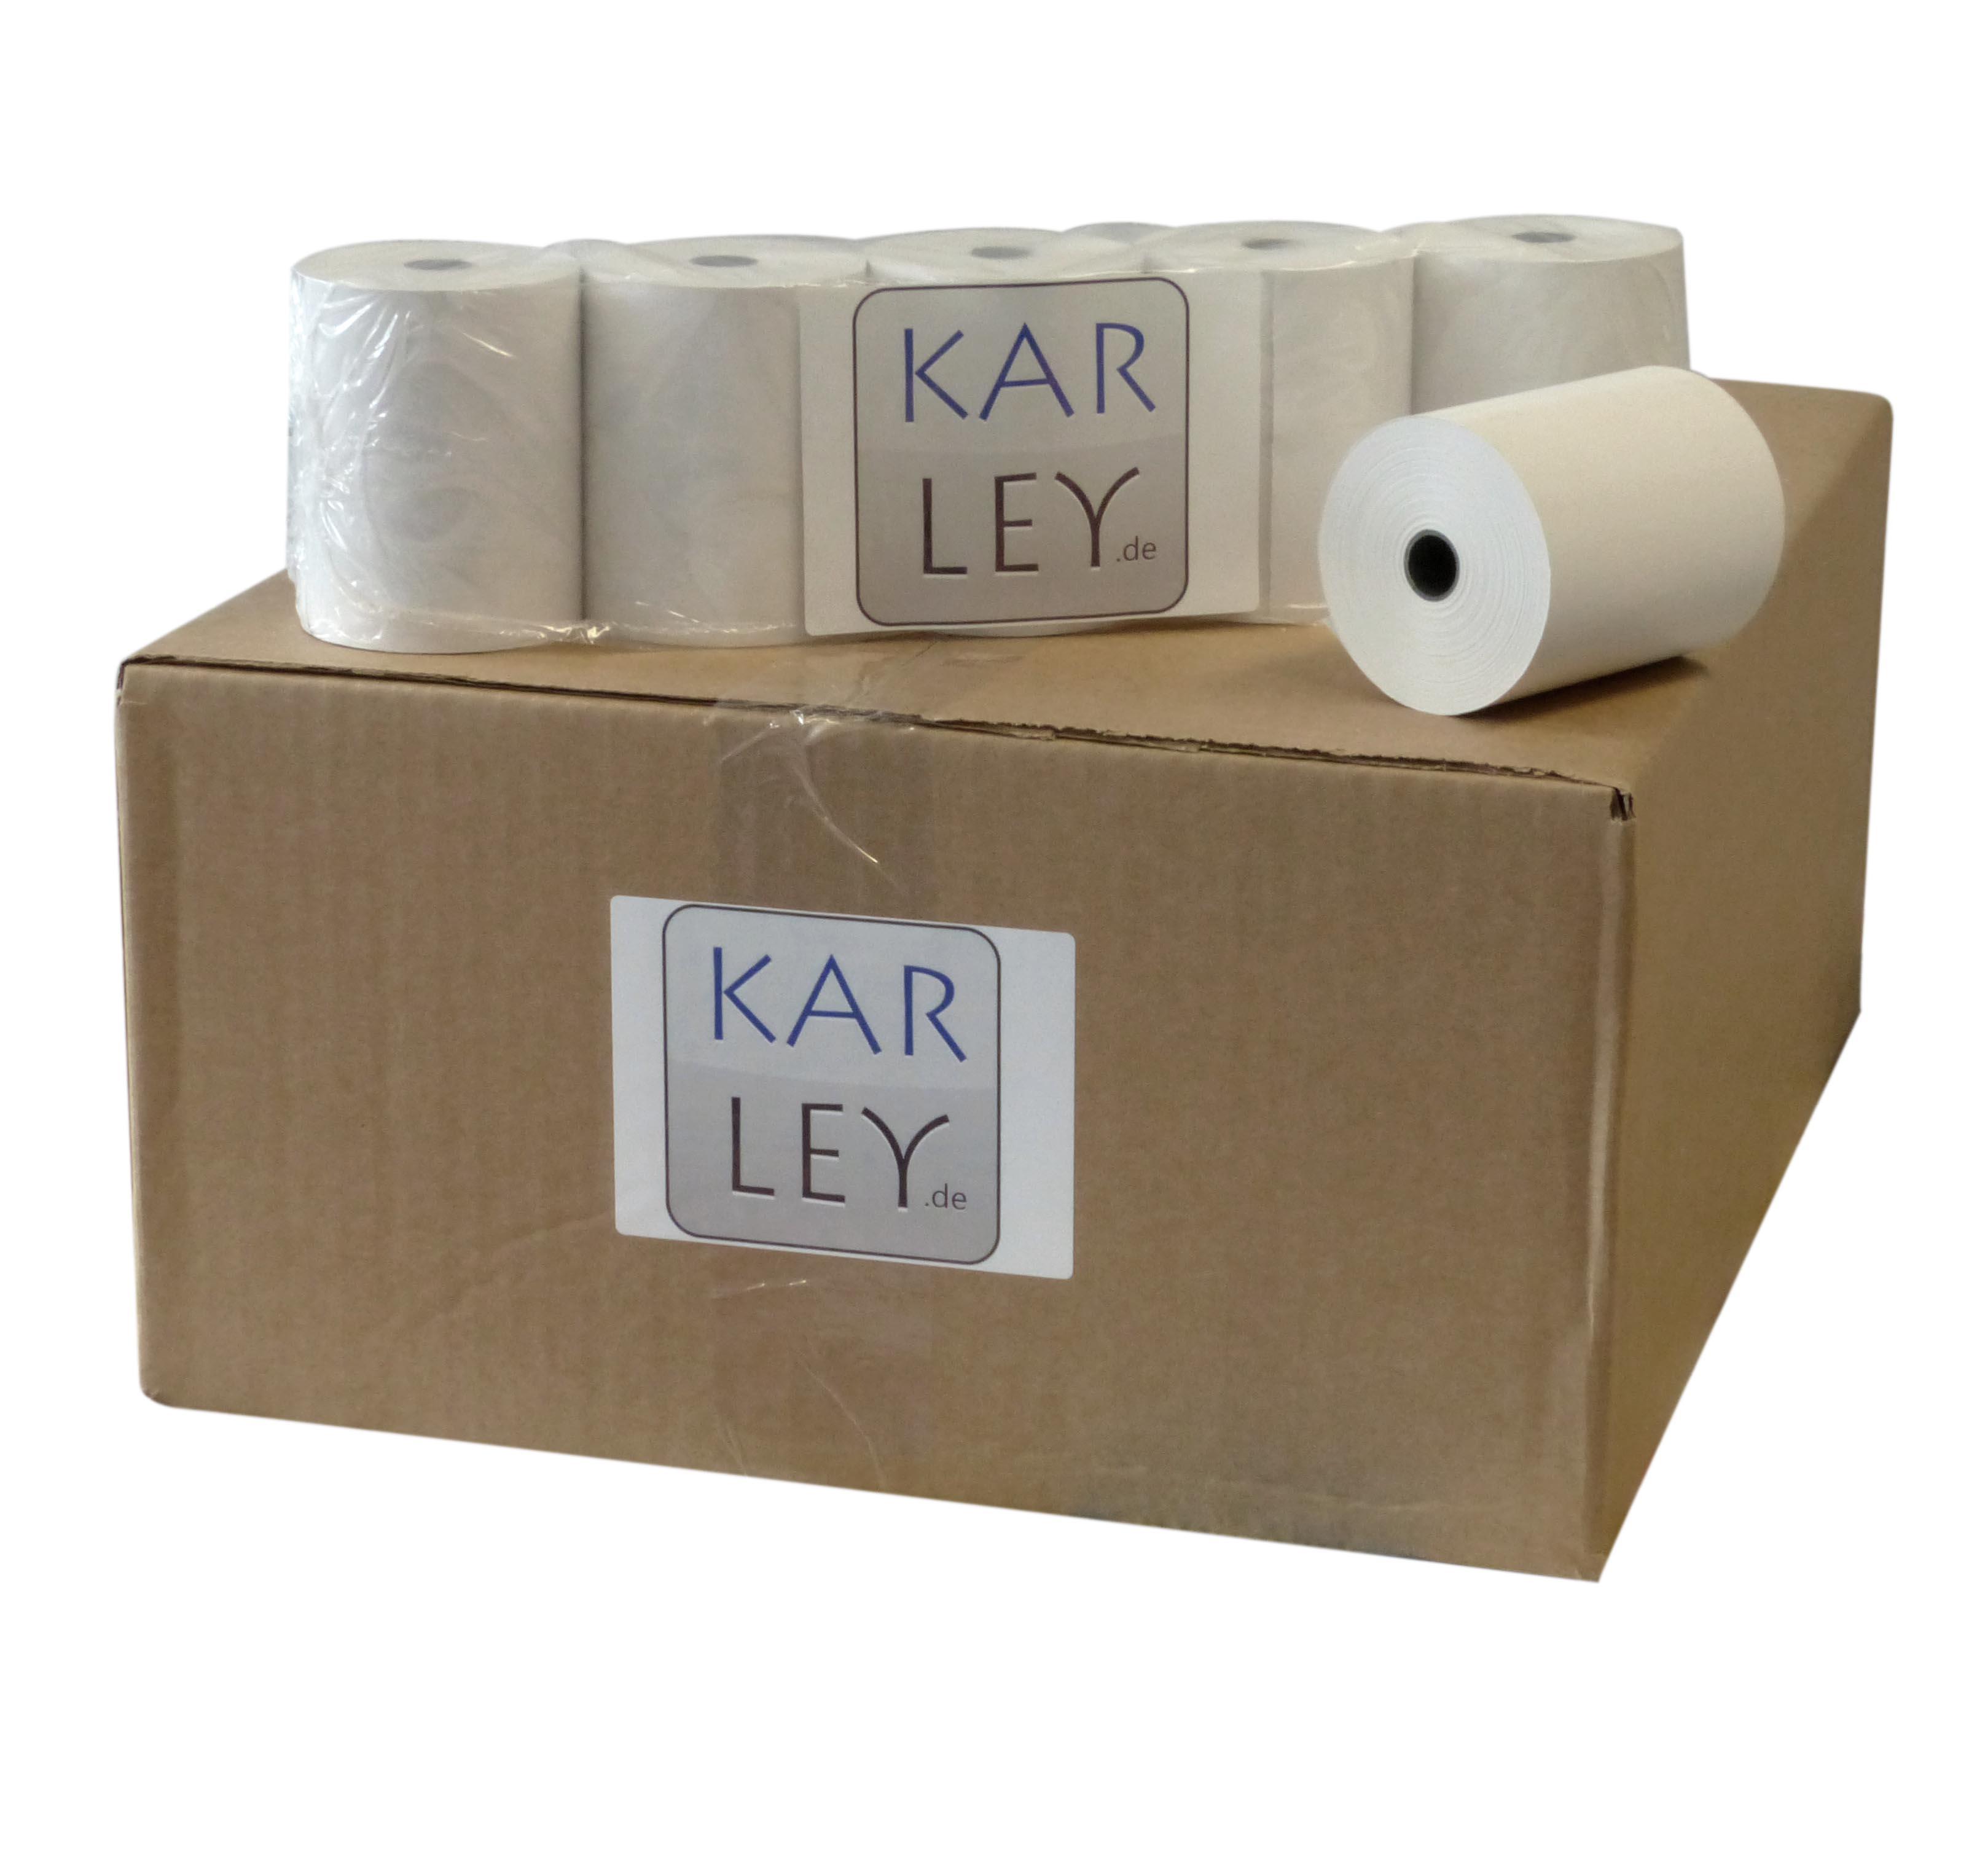 Karley Bonrolle, Normalpapier, 114mm 45001-40700